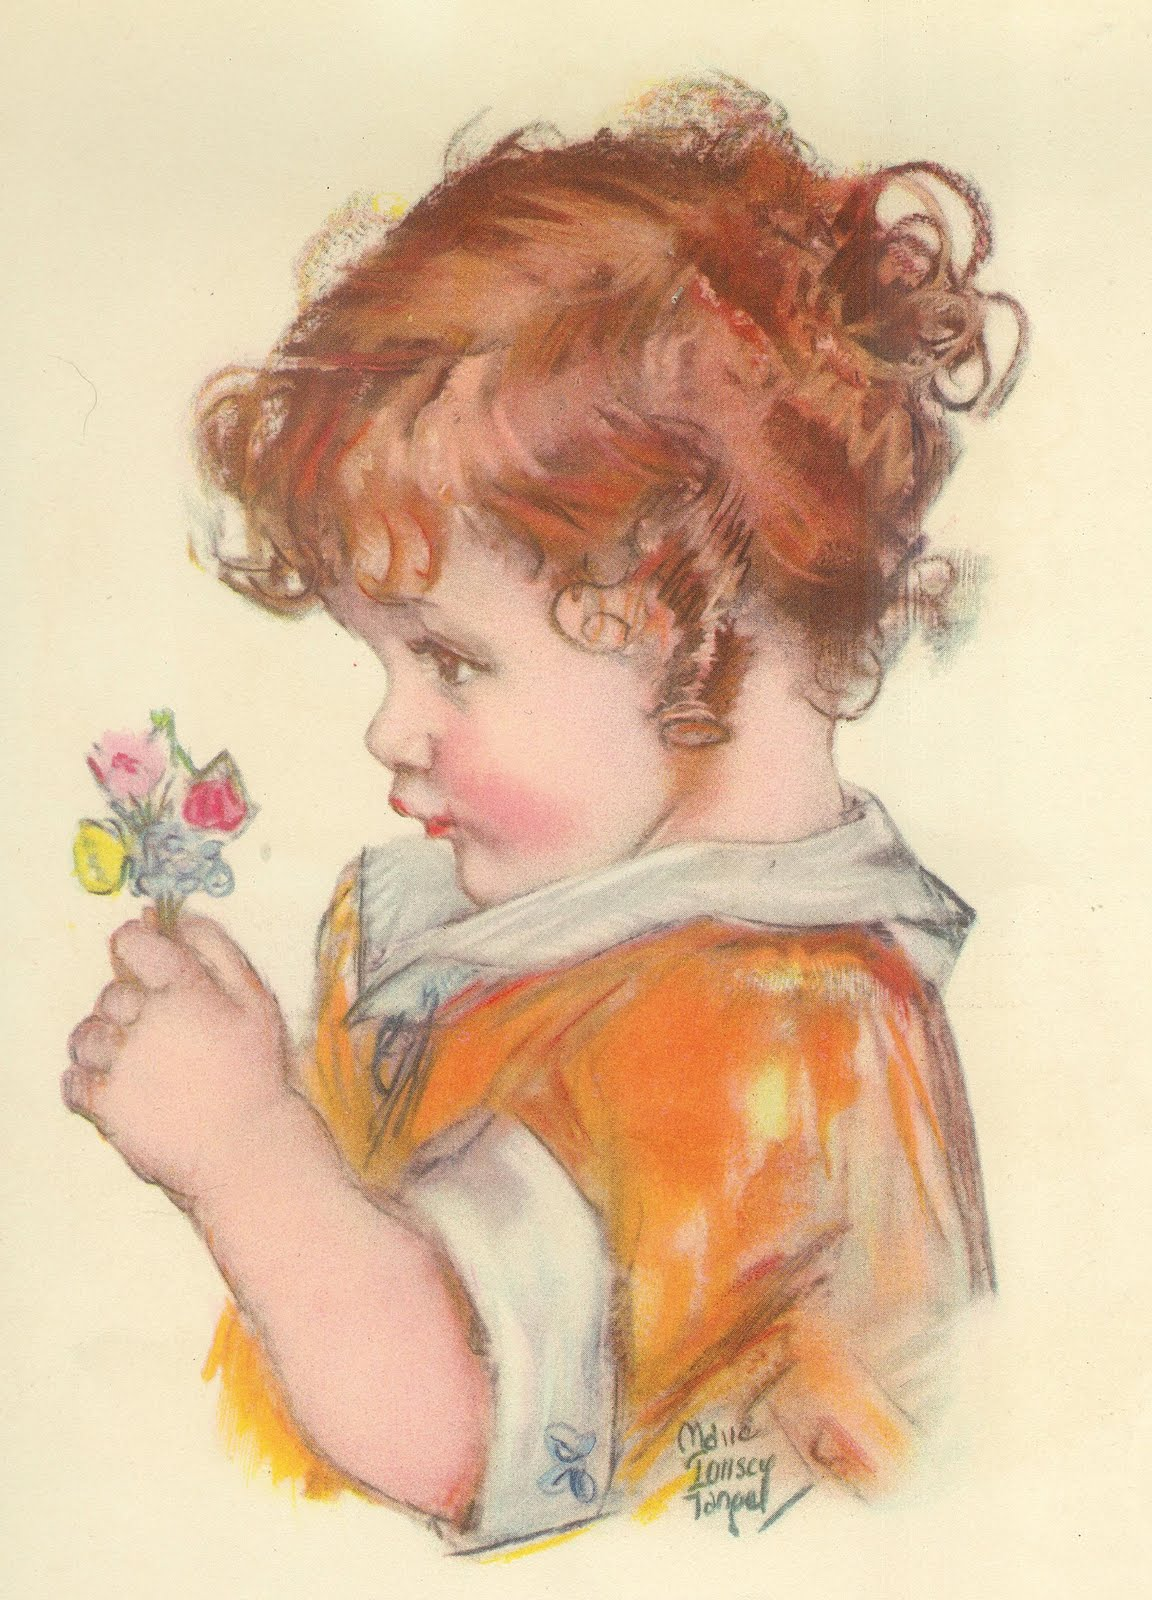 Vintage Kids Books My Kid Loves Koko S Kitten: Hazelruthes's: Vintage Children Images To Share